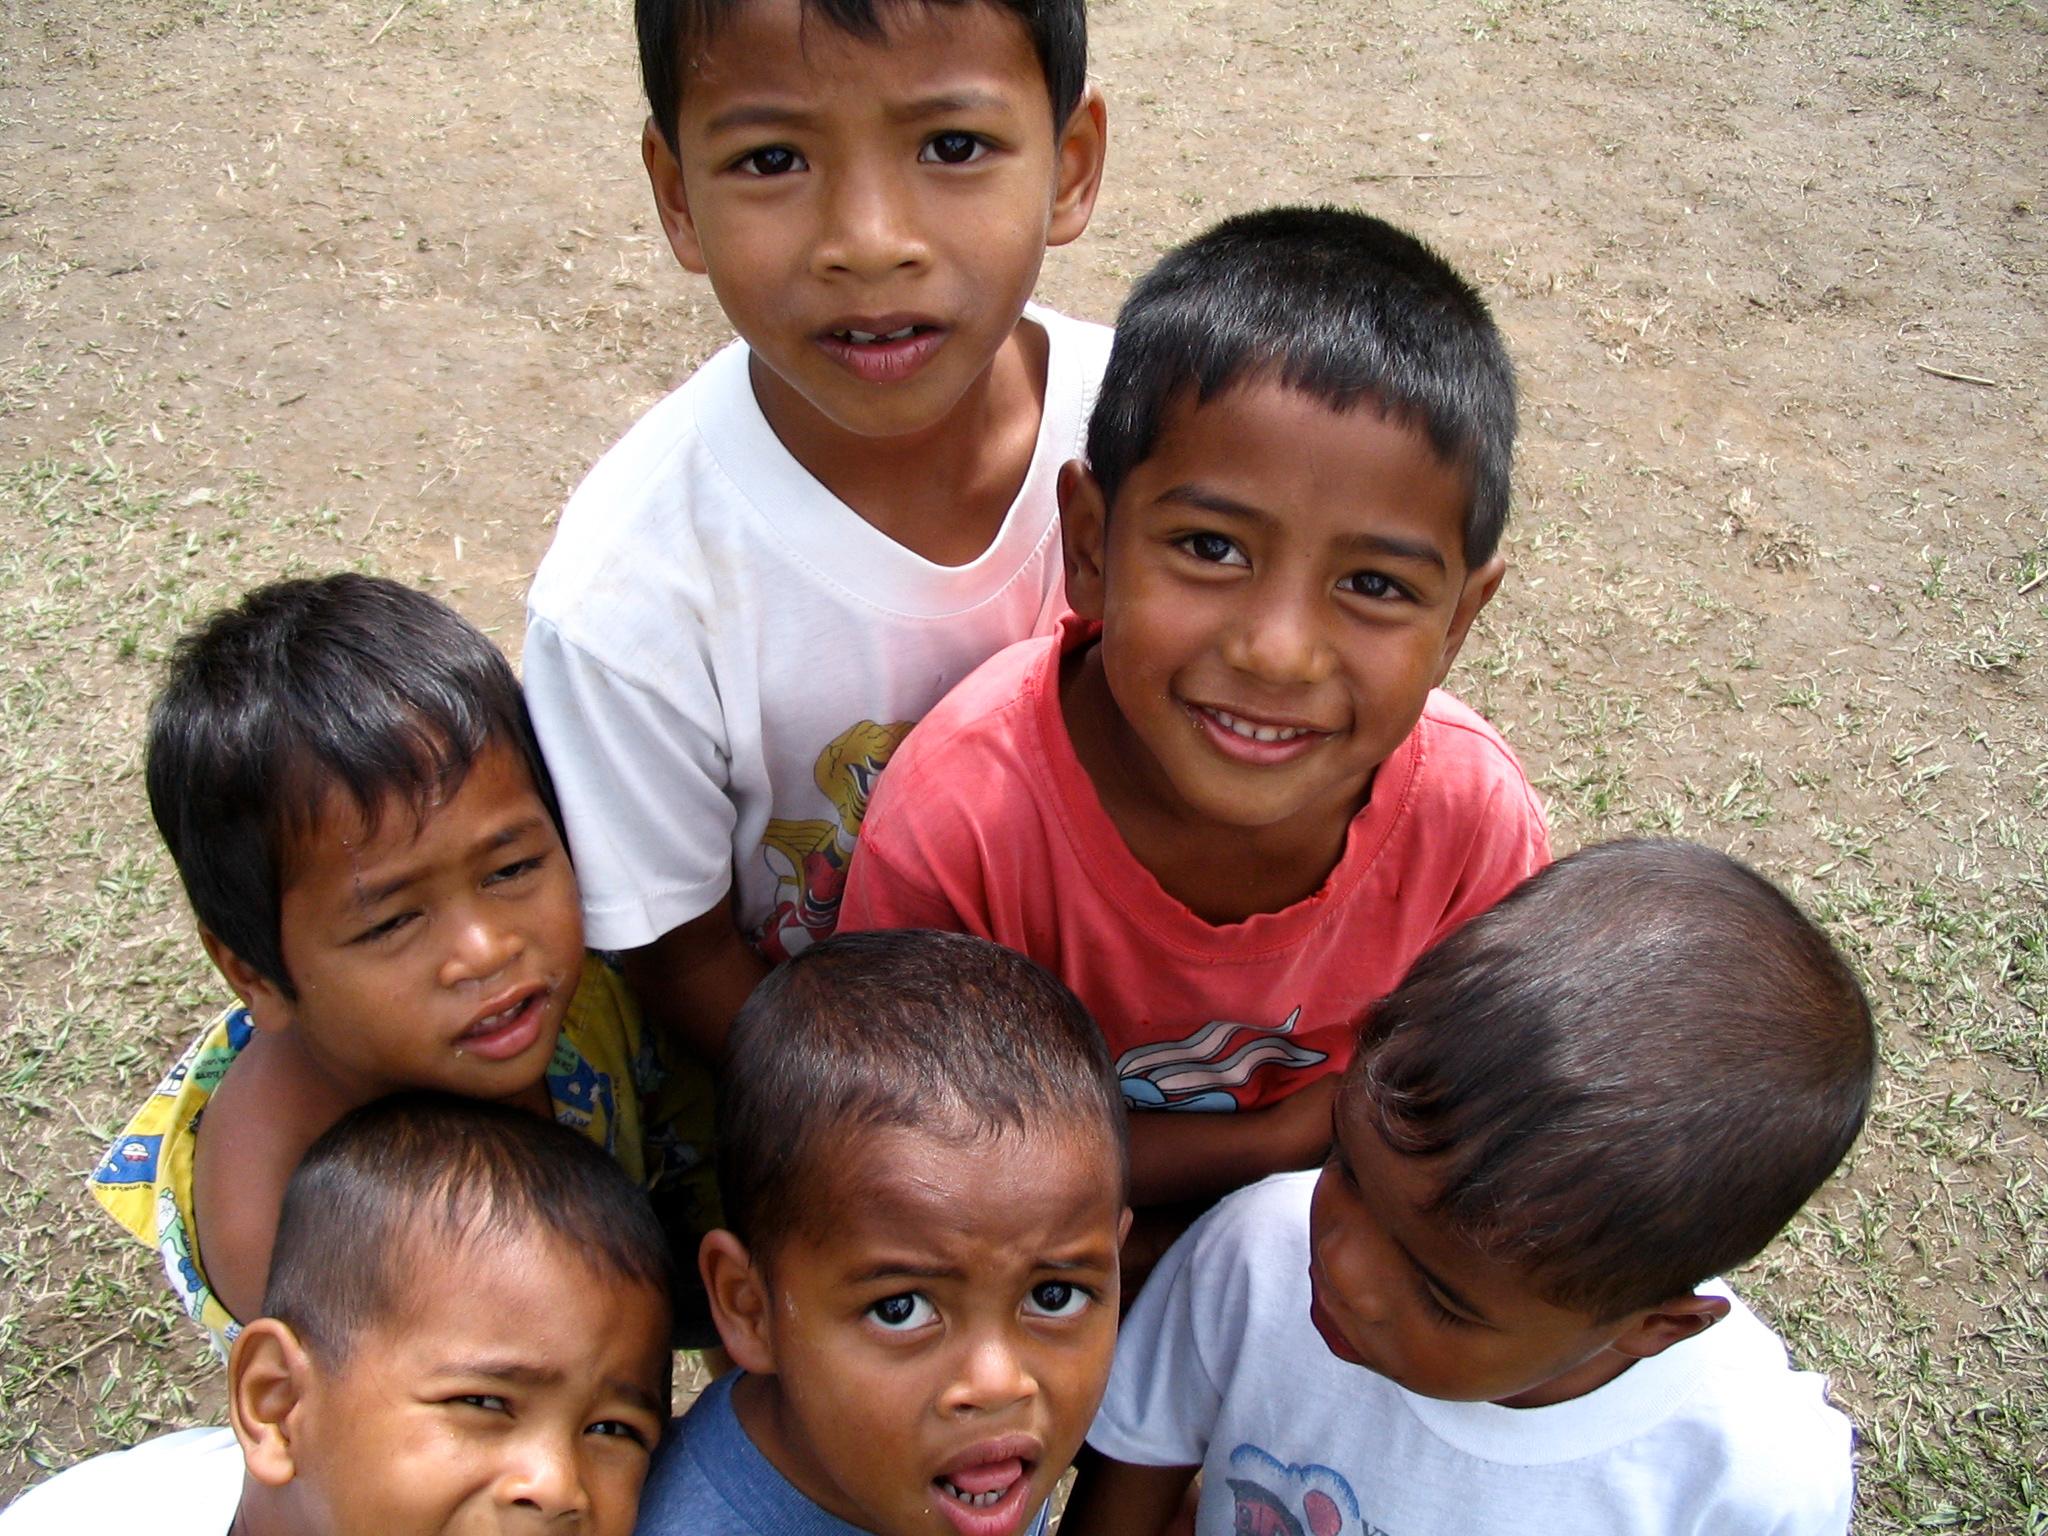 Portret jongens in Maleisie